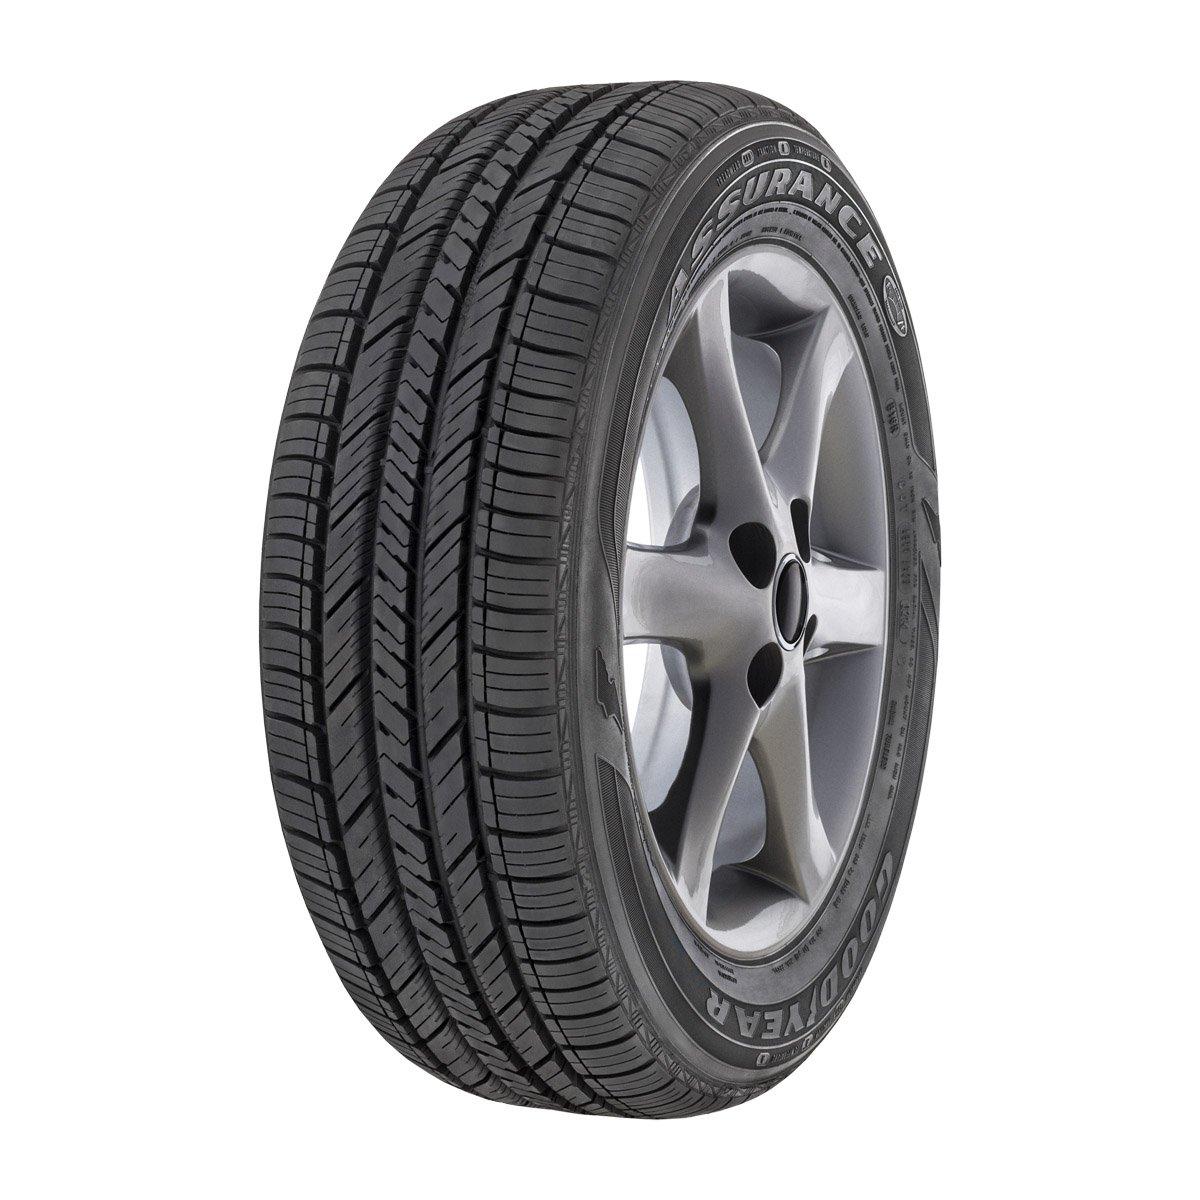 Llanta 215/70R15 Assurance Fuellmax